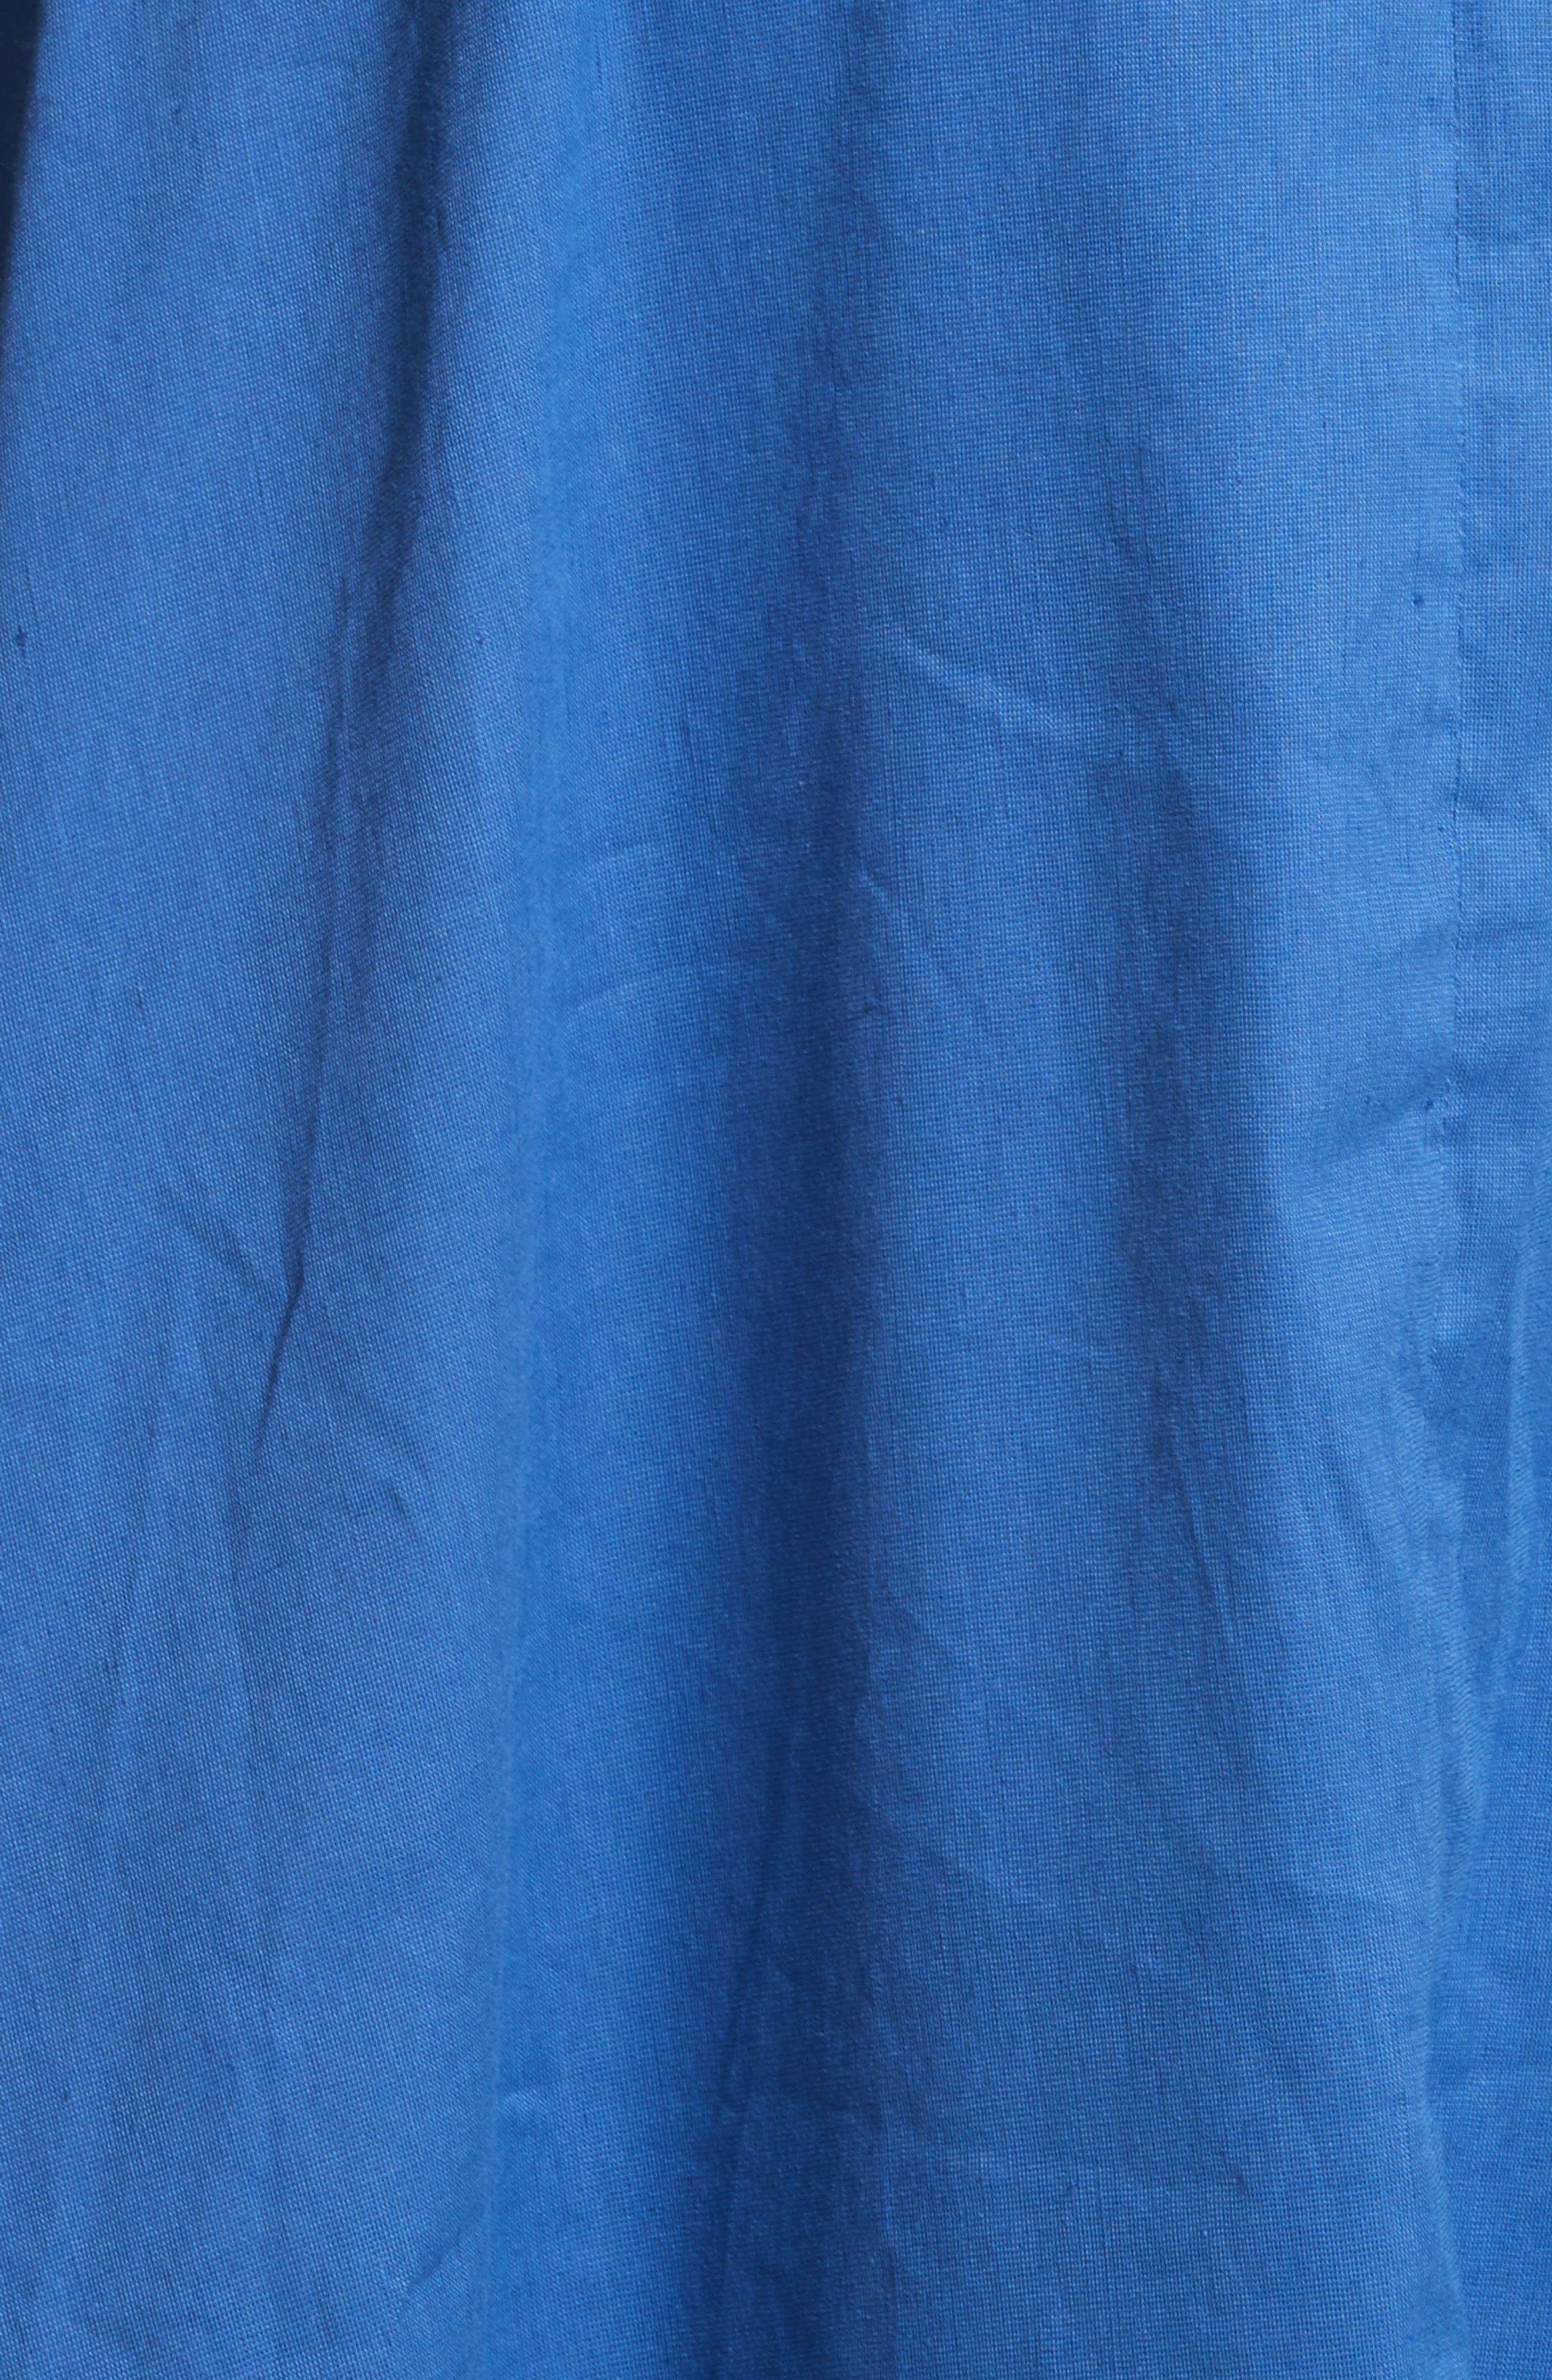 Michaela Linen Dress,                             Alternate thumbnail 5, color,                             Linen Blue